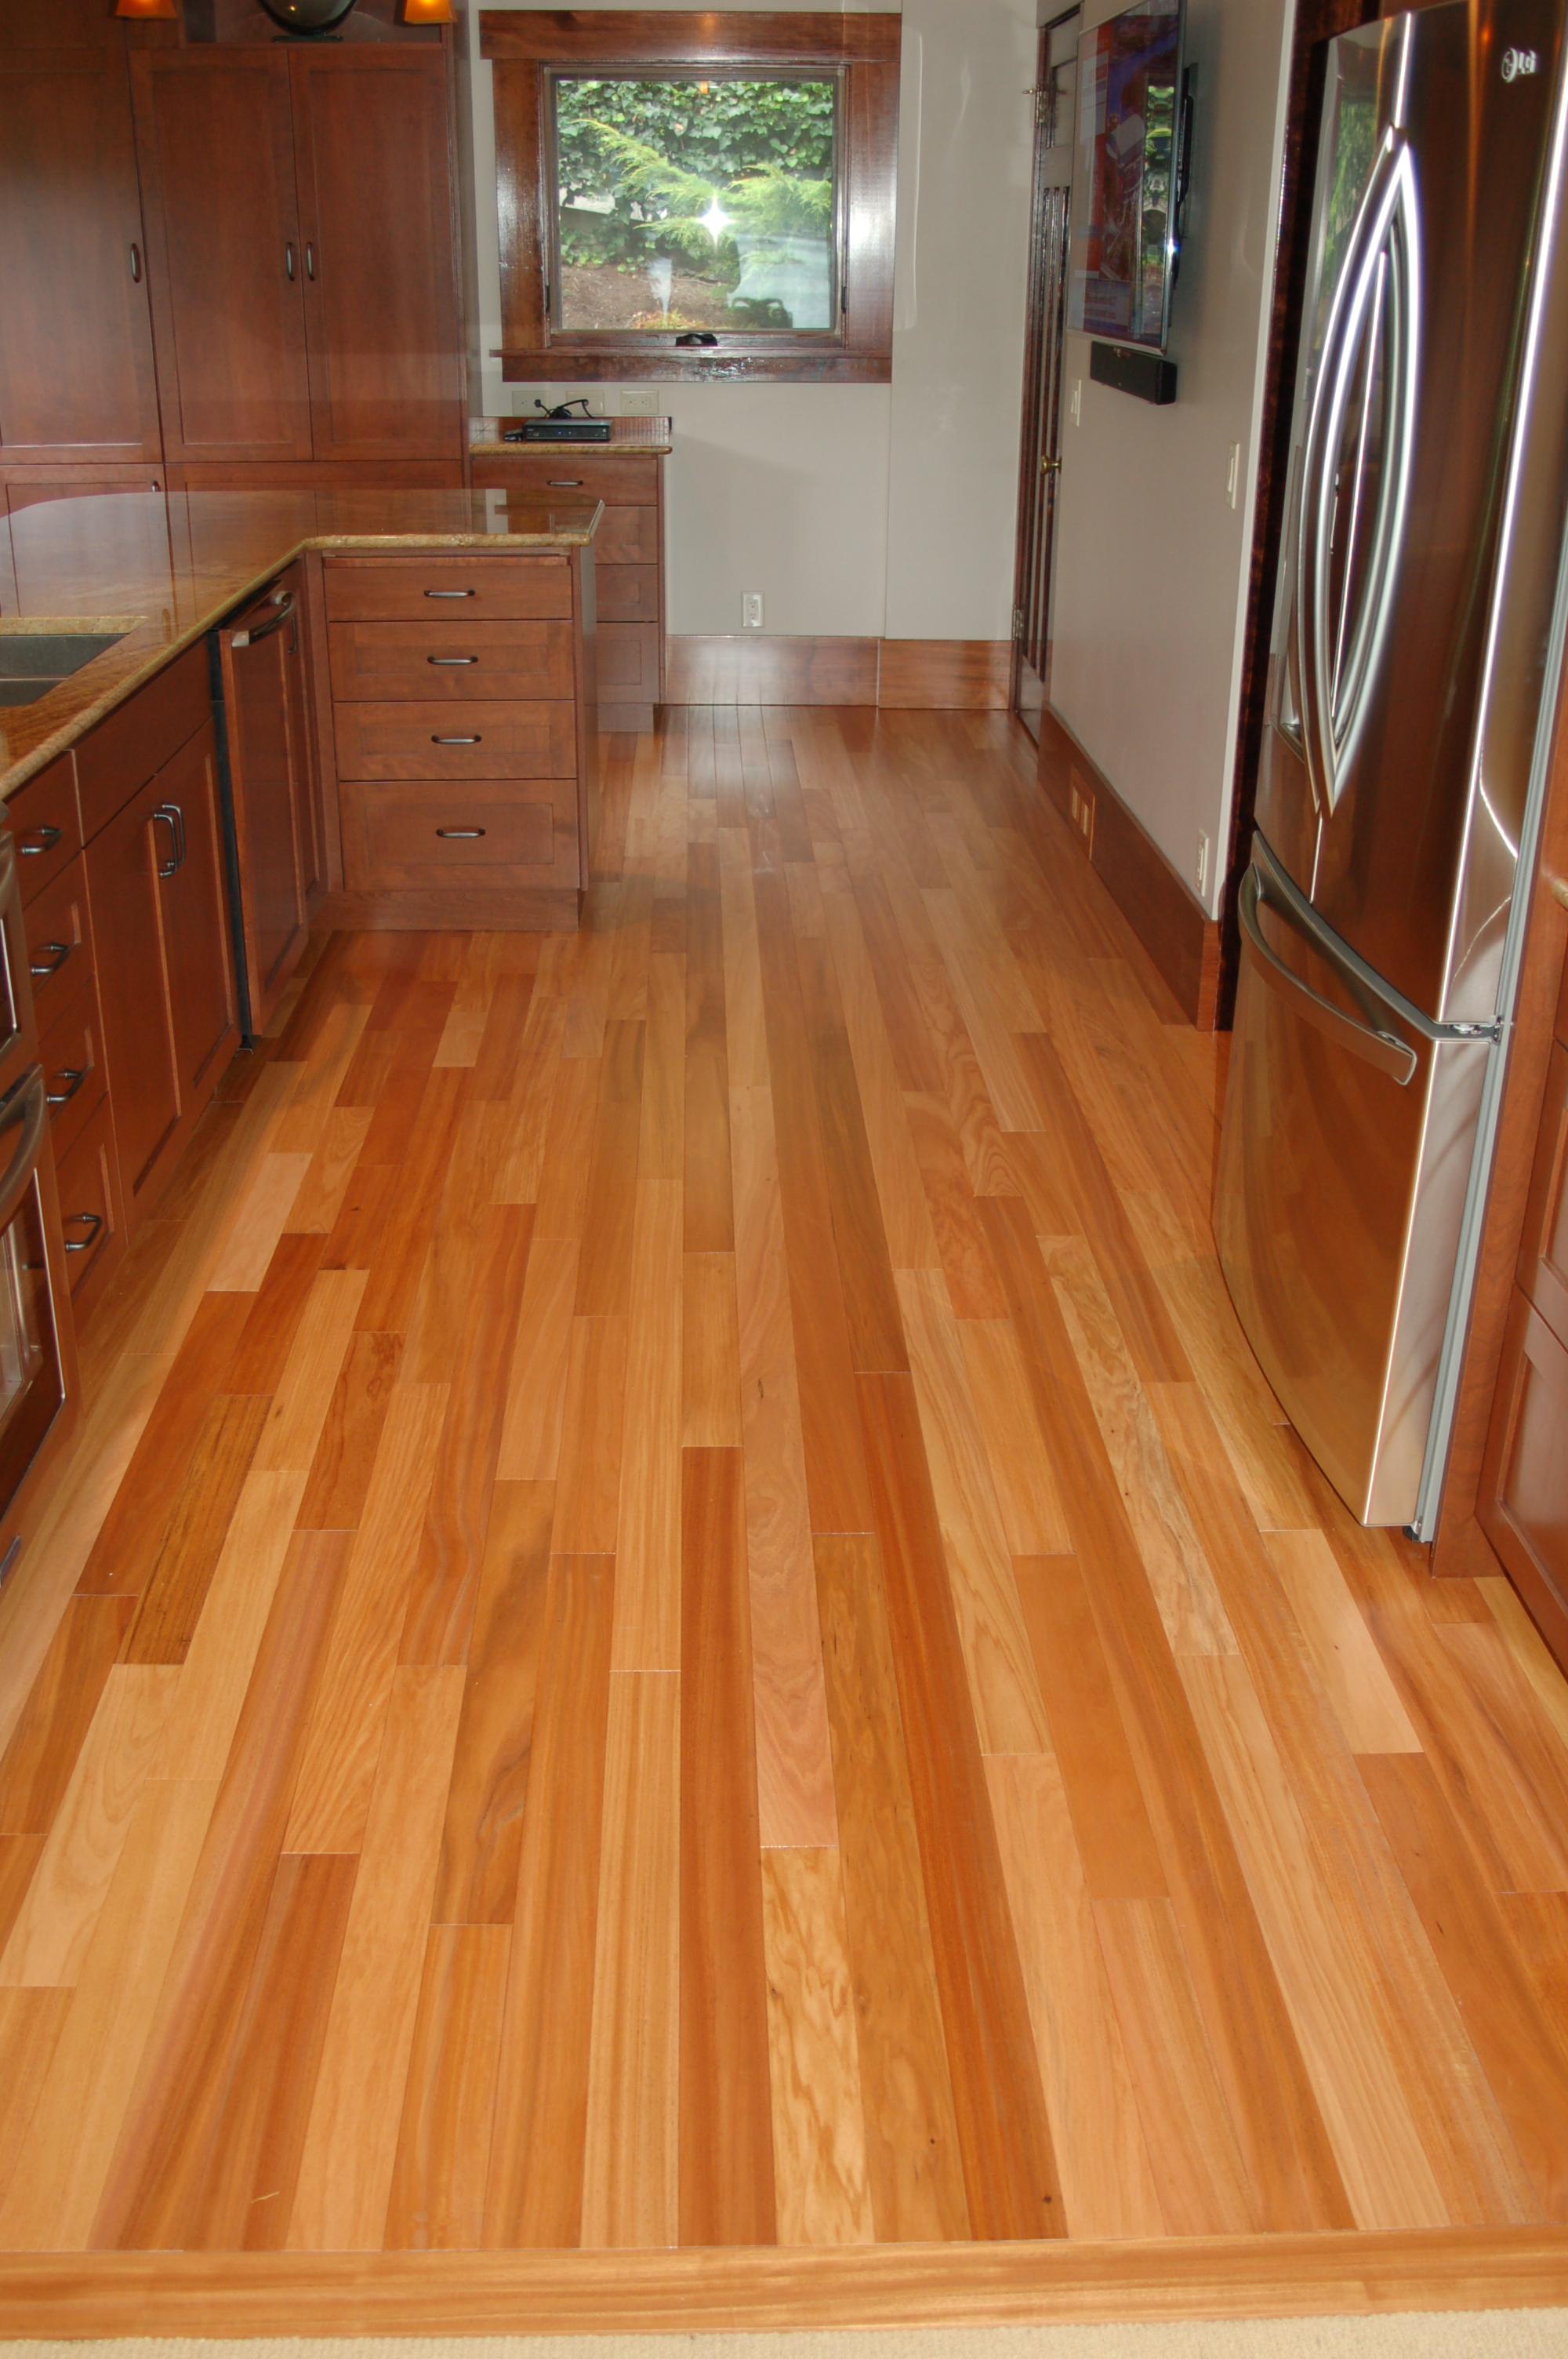 Kitchen remodel Part II of IV Choosing the best flooring